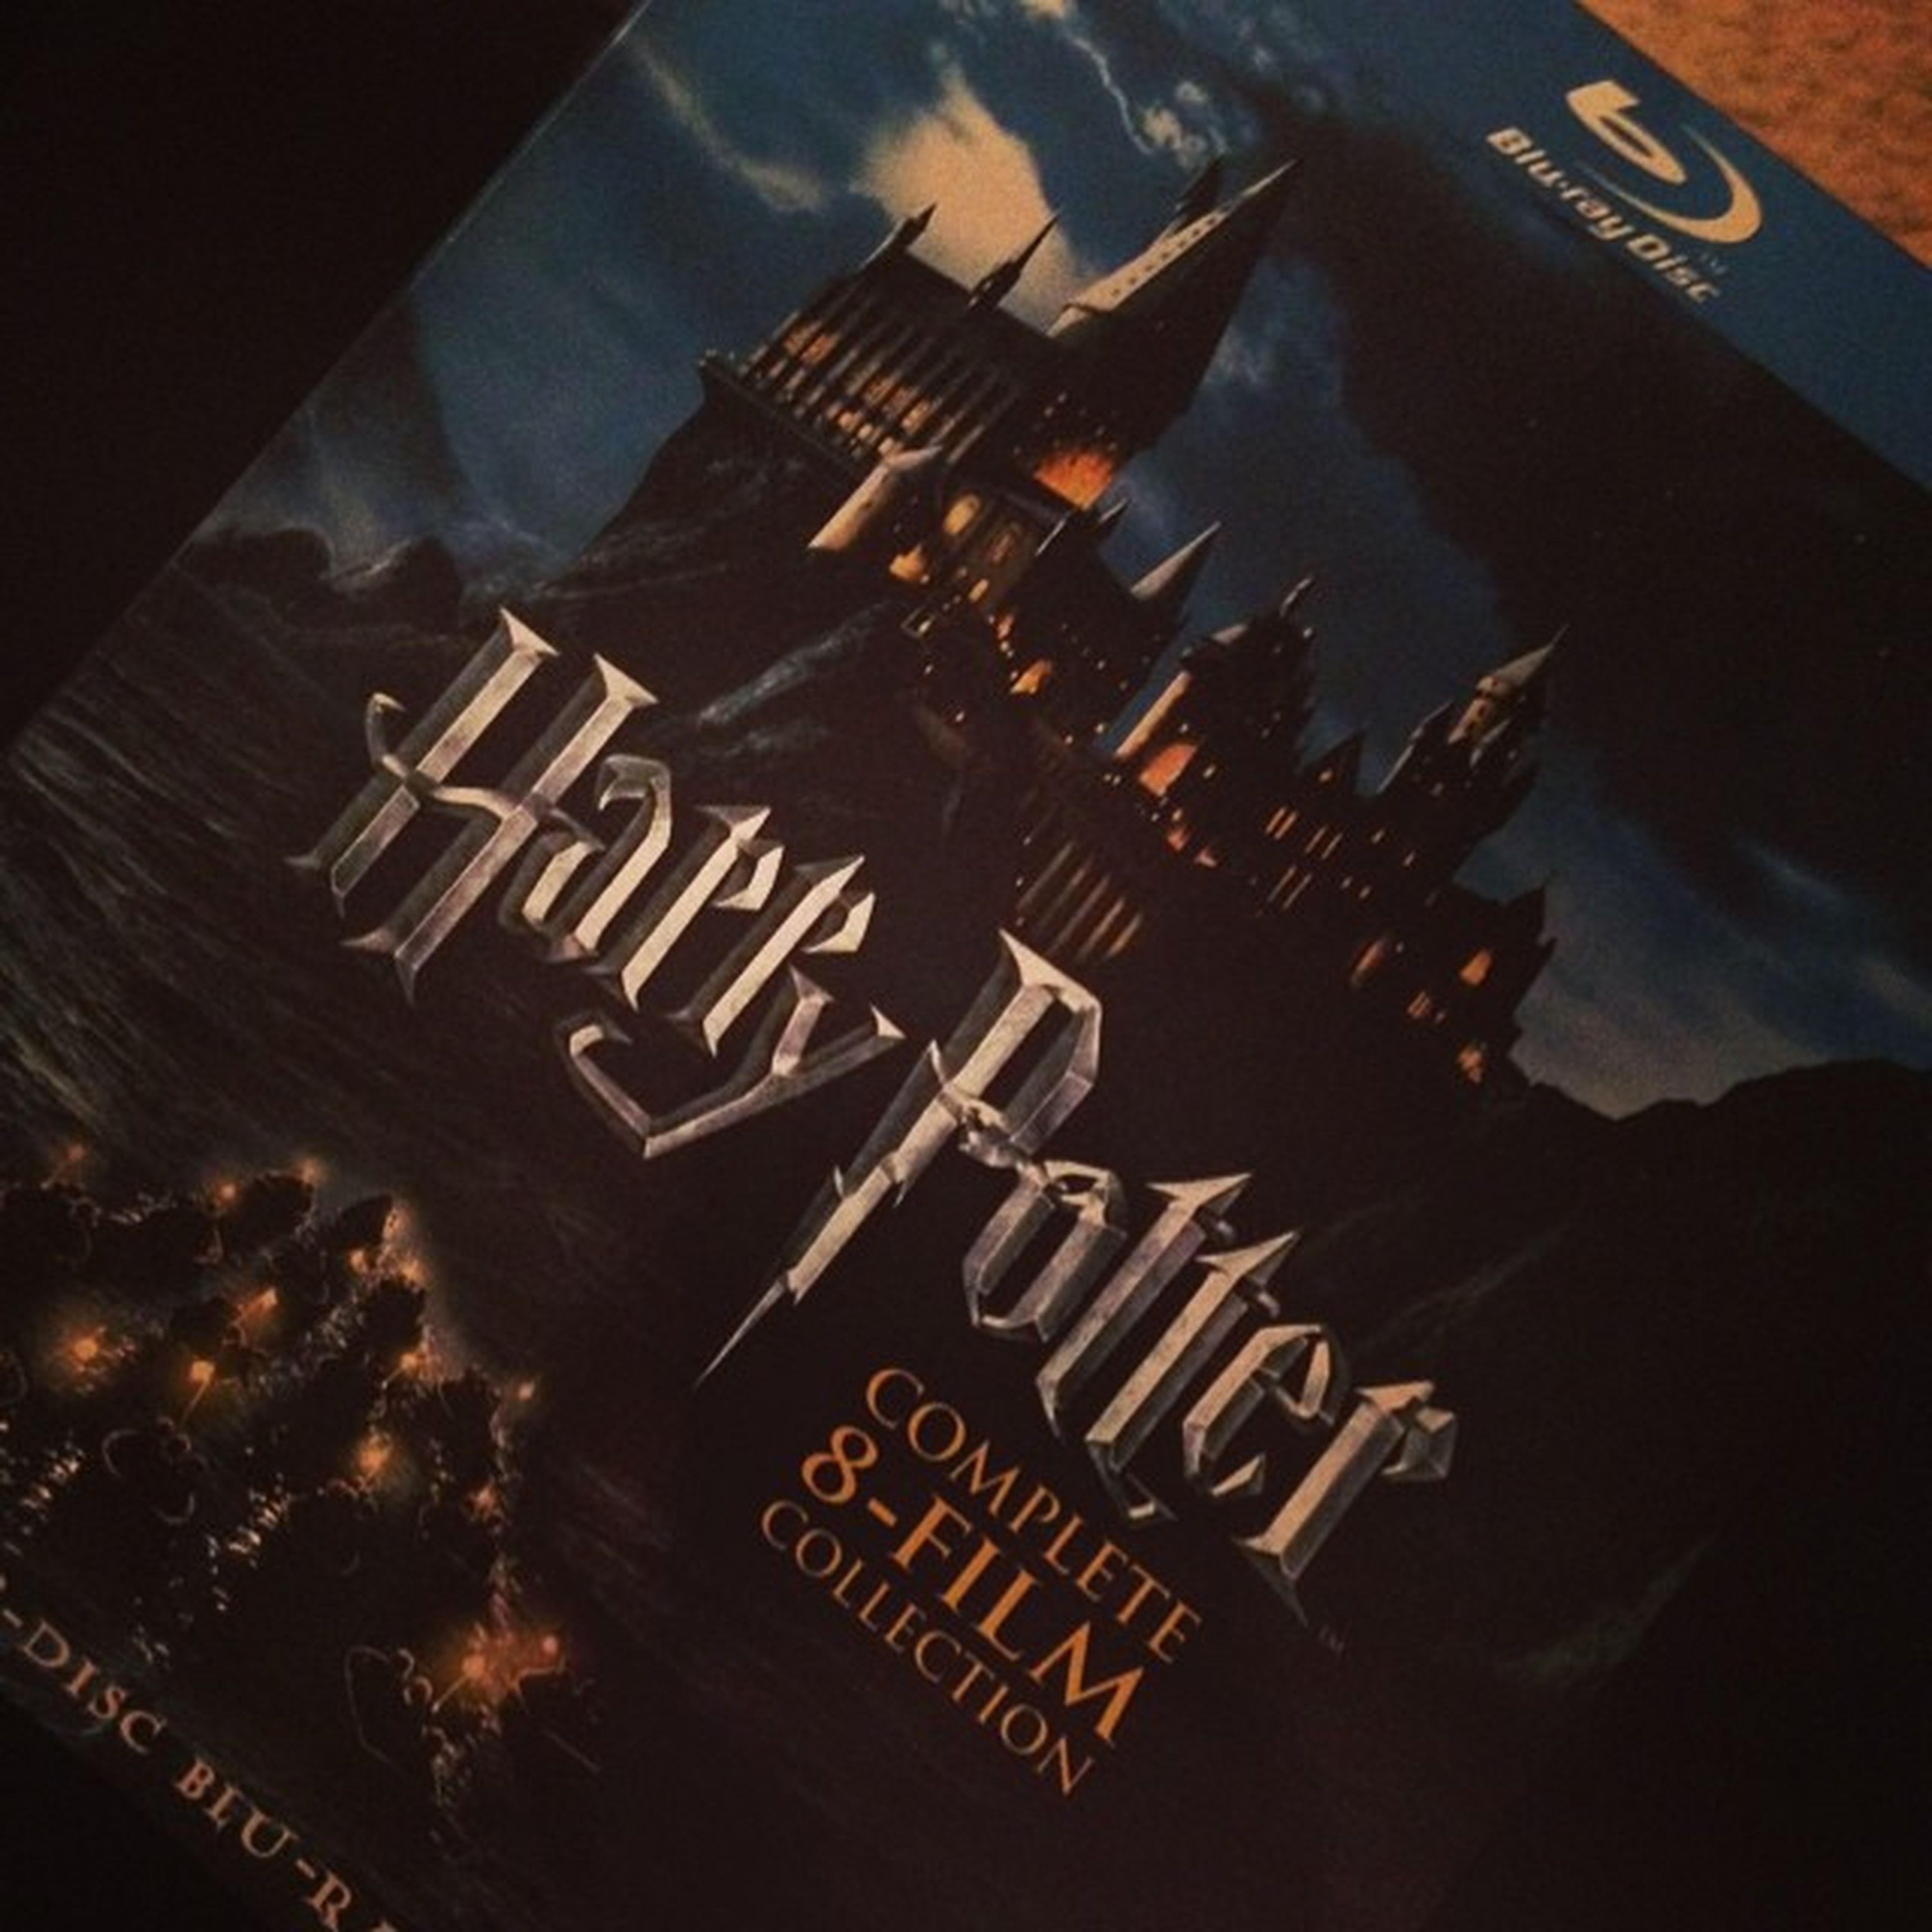 Oh snap son! Harry Potter marathon til my eyes bleed ??????? Bluray Harrypotternerd Harrypotterforever